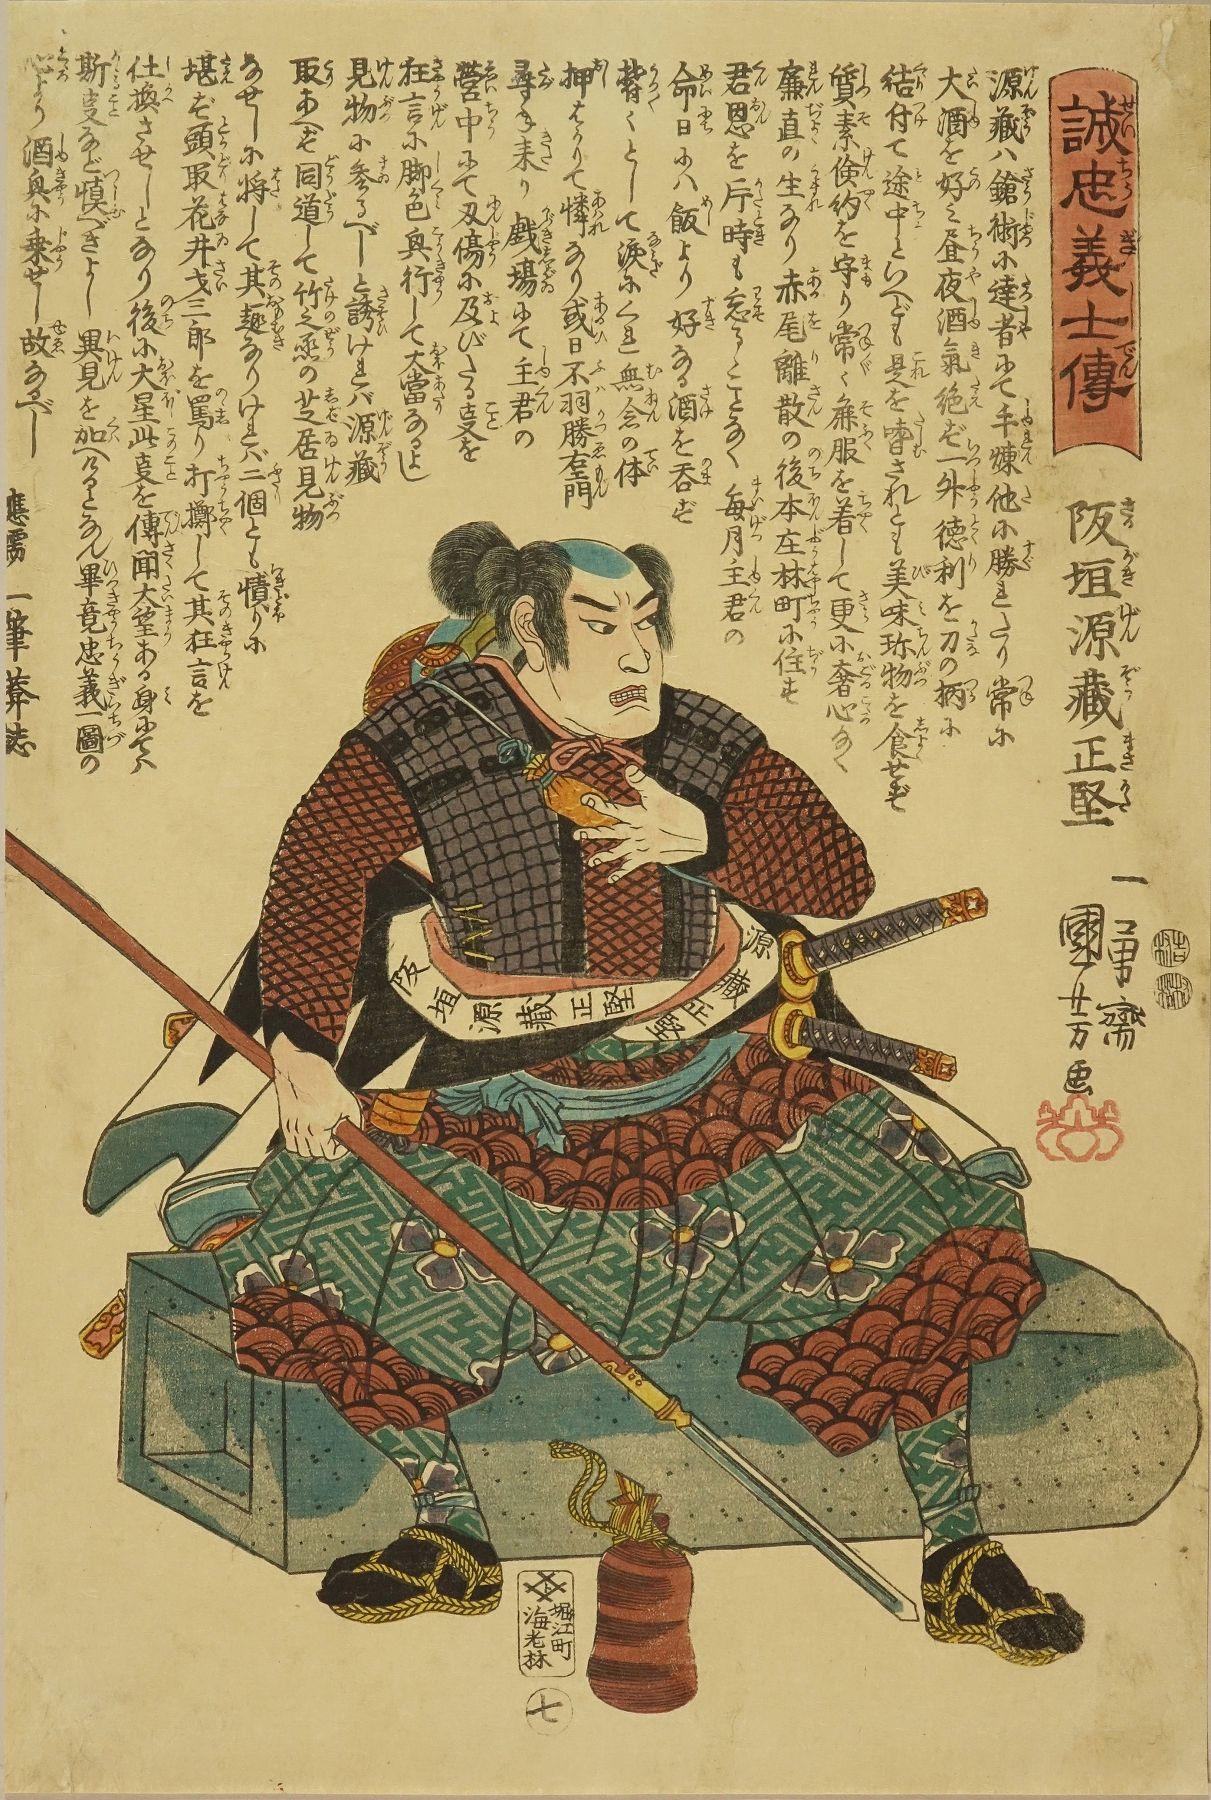 KUNIYOSHI Sakagaki Genzo Masakata (Ushioda Matanojo Takanori), from <i>Seichu gishiden</i> (Stories of the true loyalty of the faithful samurai)